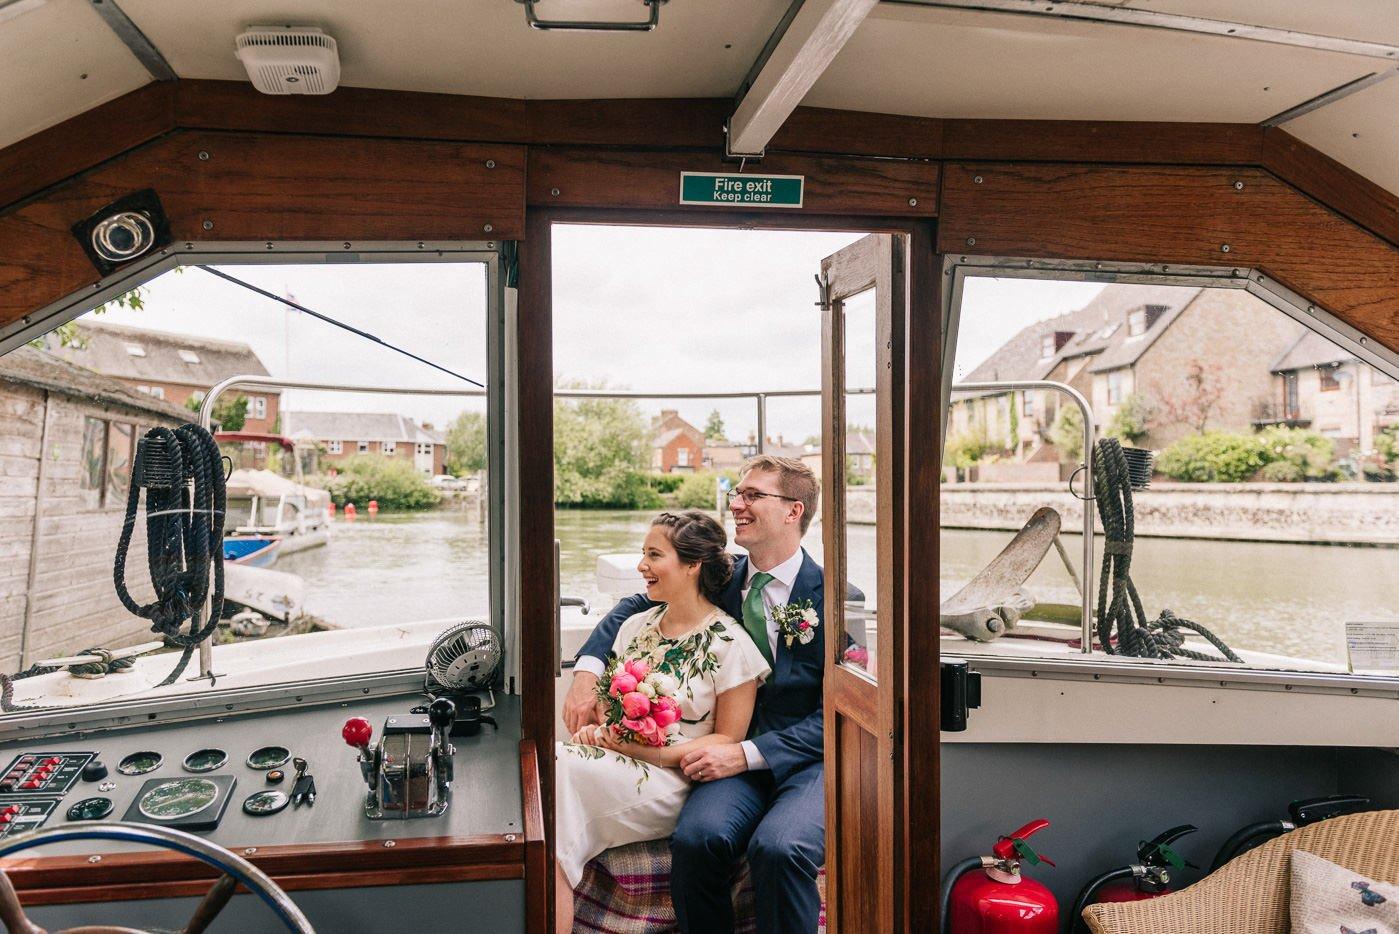 Thames river boat portrait The Perch Oxford